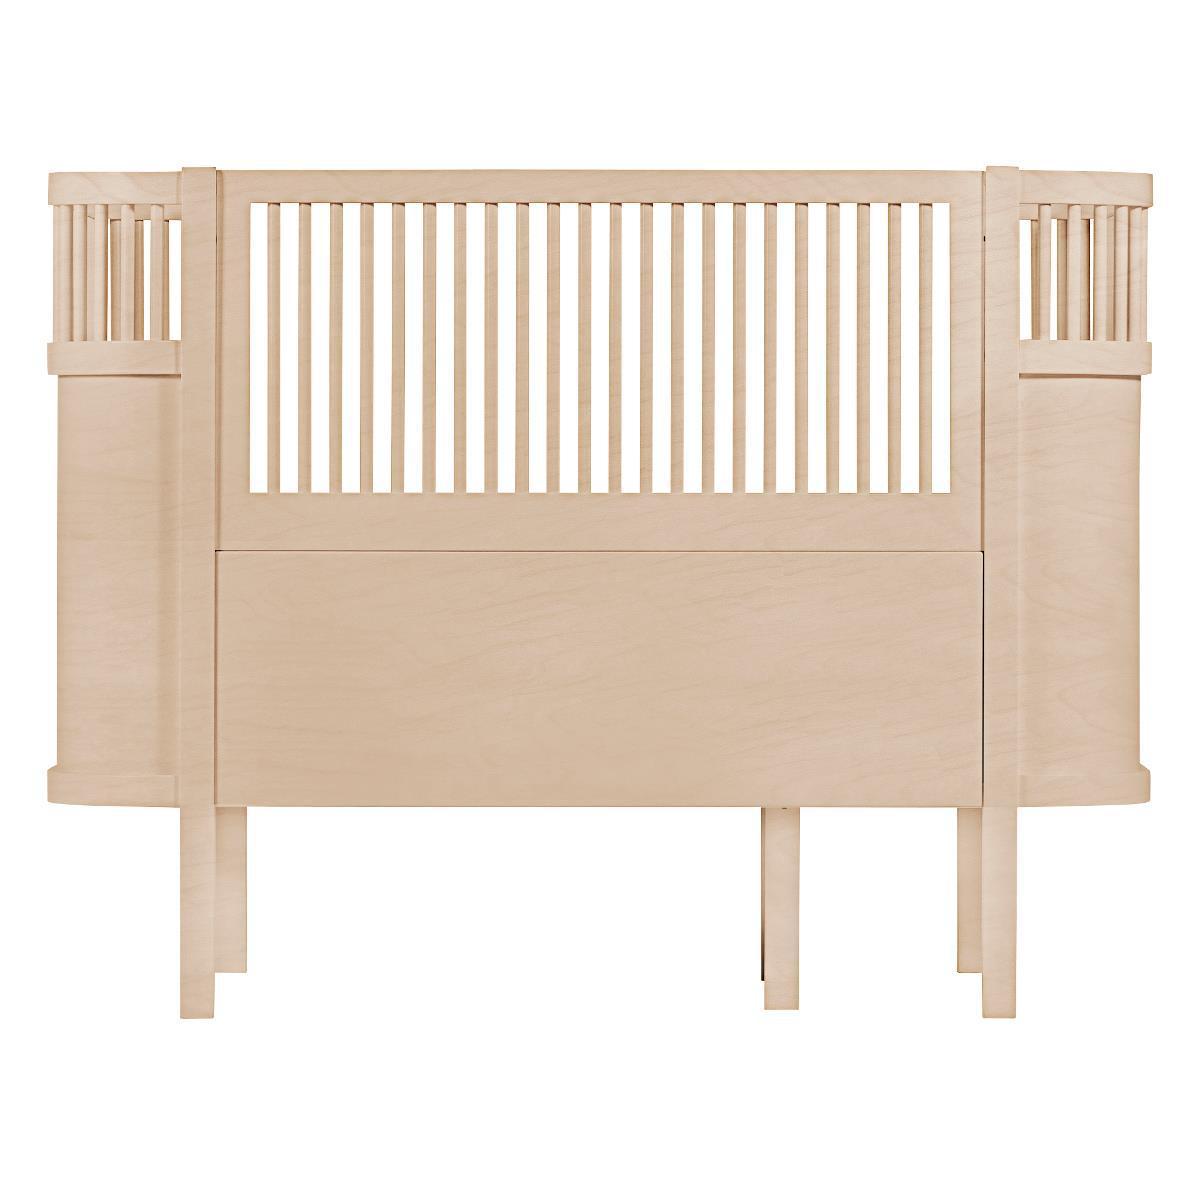 Lit bébé Lit Bébé Evolutif Sebra Bed Bois - 70 x 110 cm Lit Bébé Evolutif Sebra Bed Bois - 70 x 110 cm